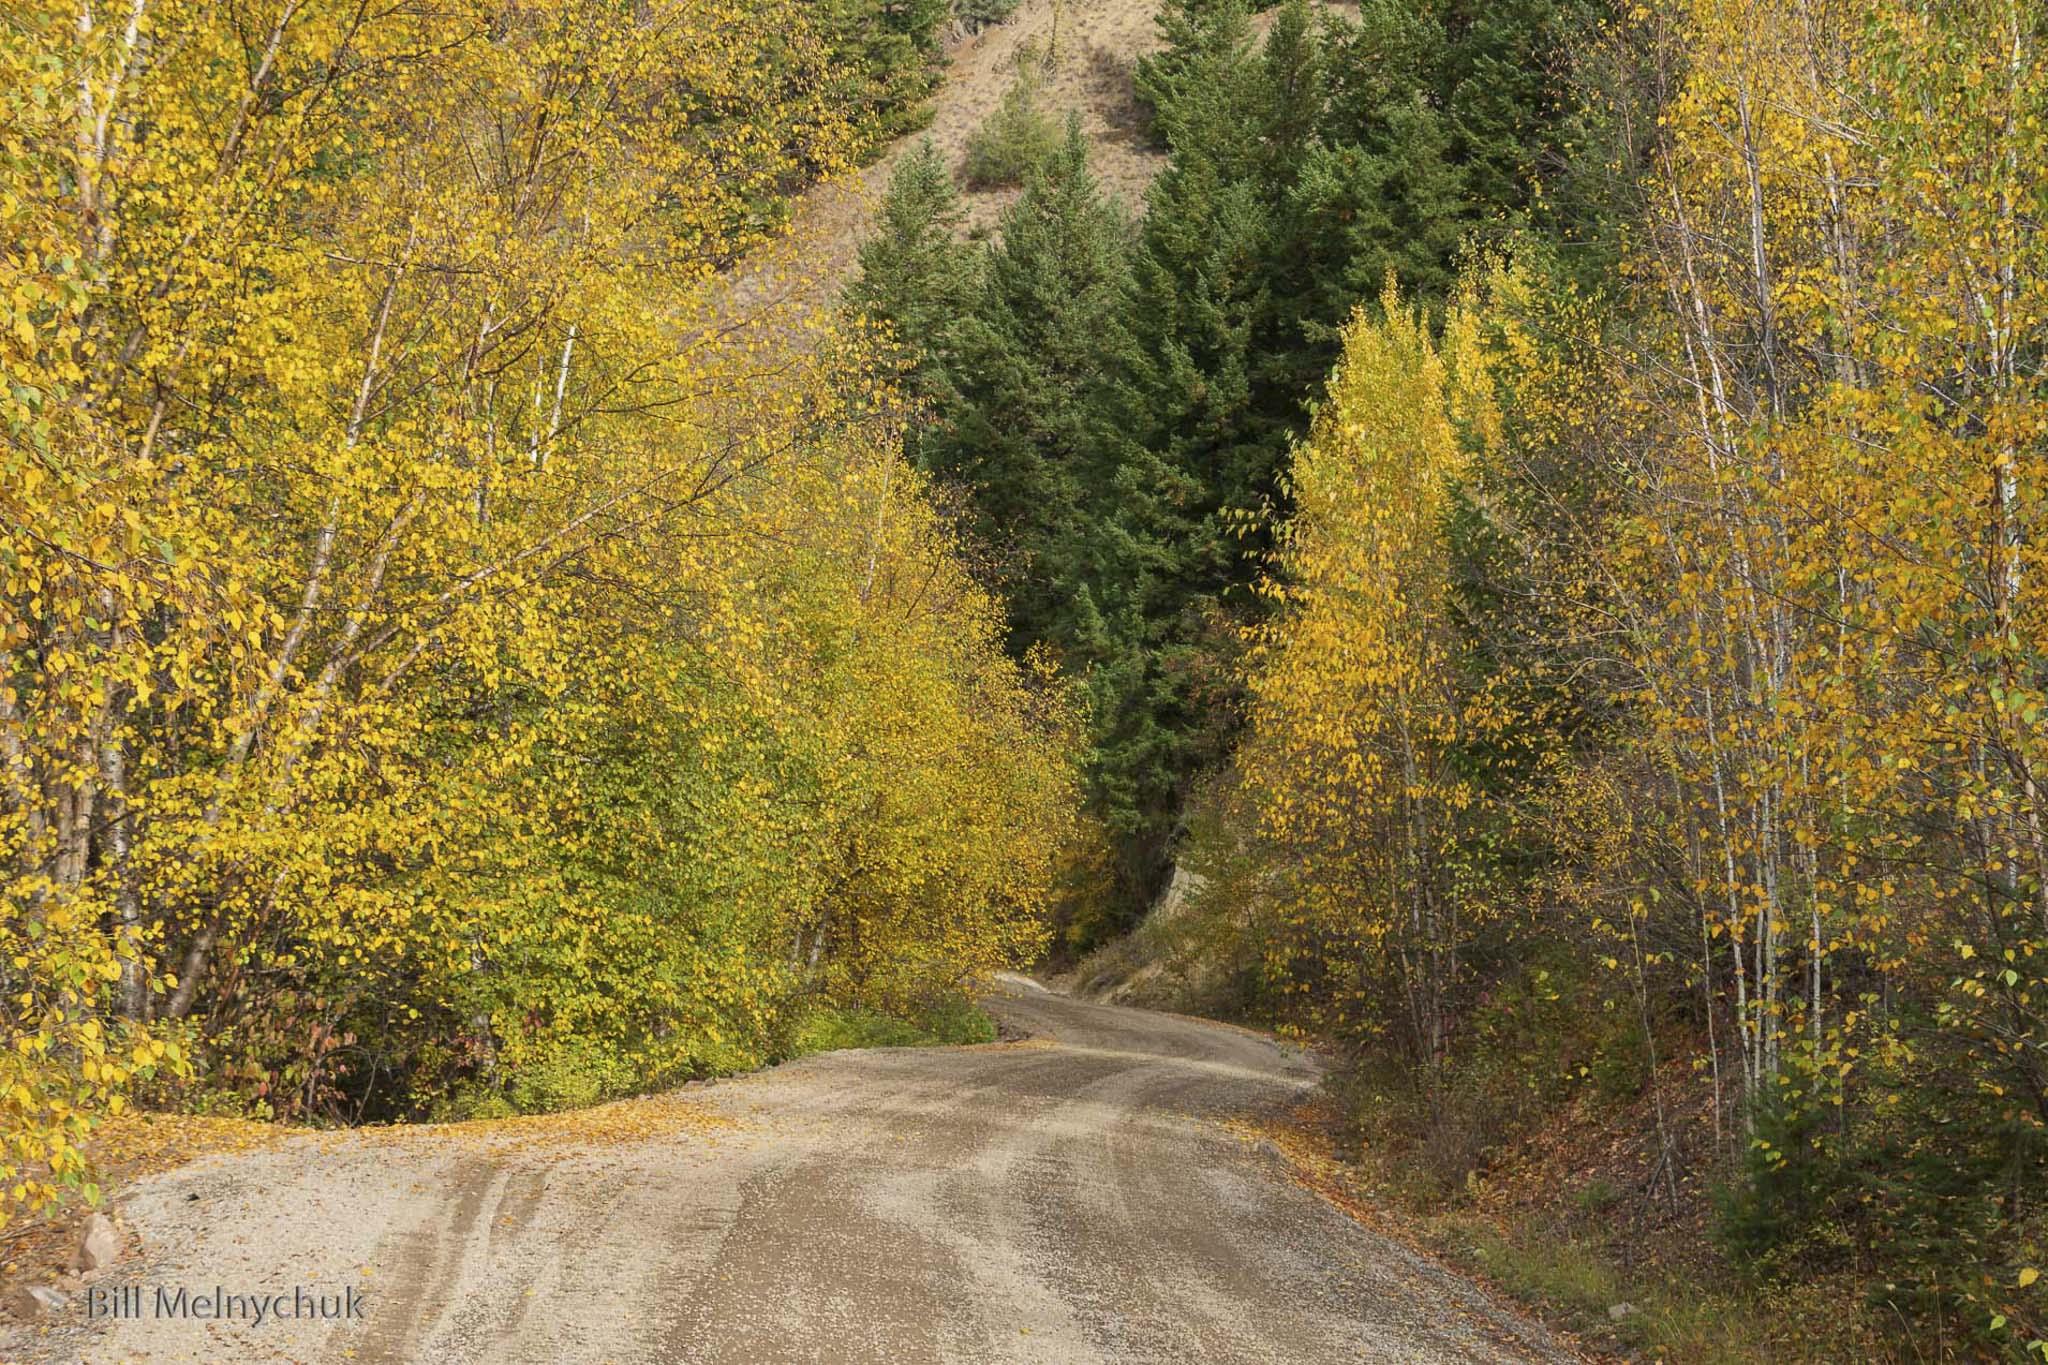 Road to Gold 5128 - Bill Melnychuk.jpg